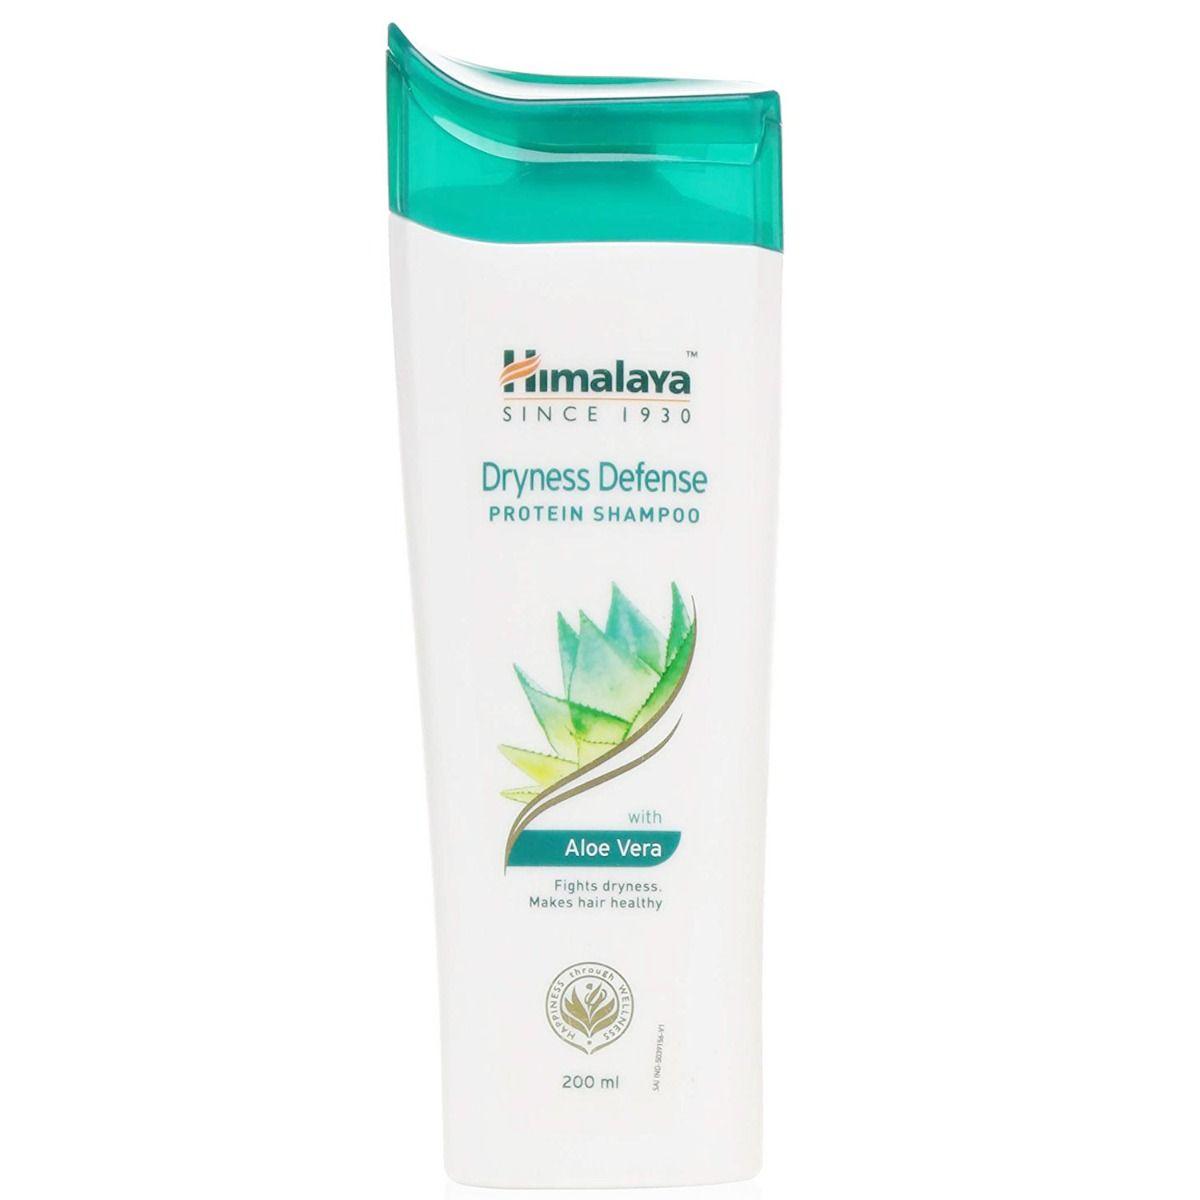 Himalaya Dryness Defense Protein Shampoo With Aloe Vera, 200 ml